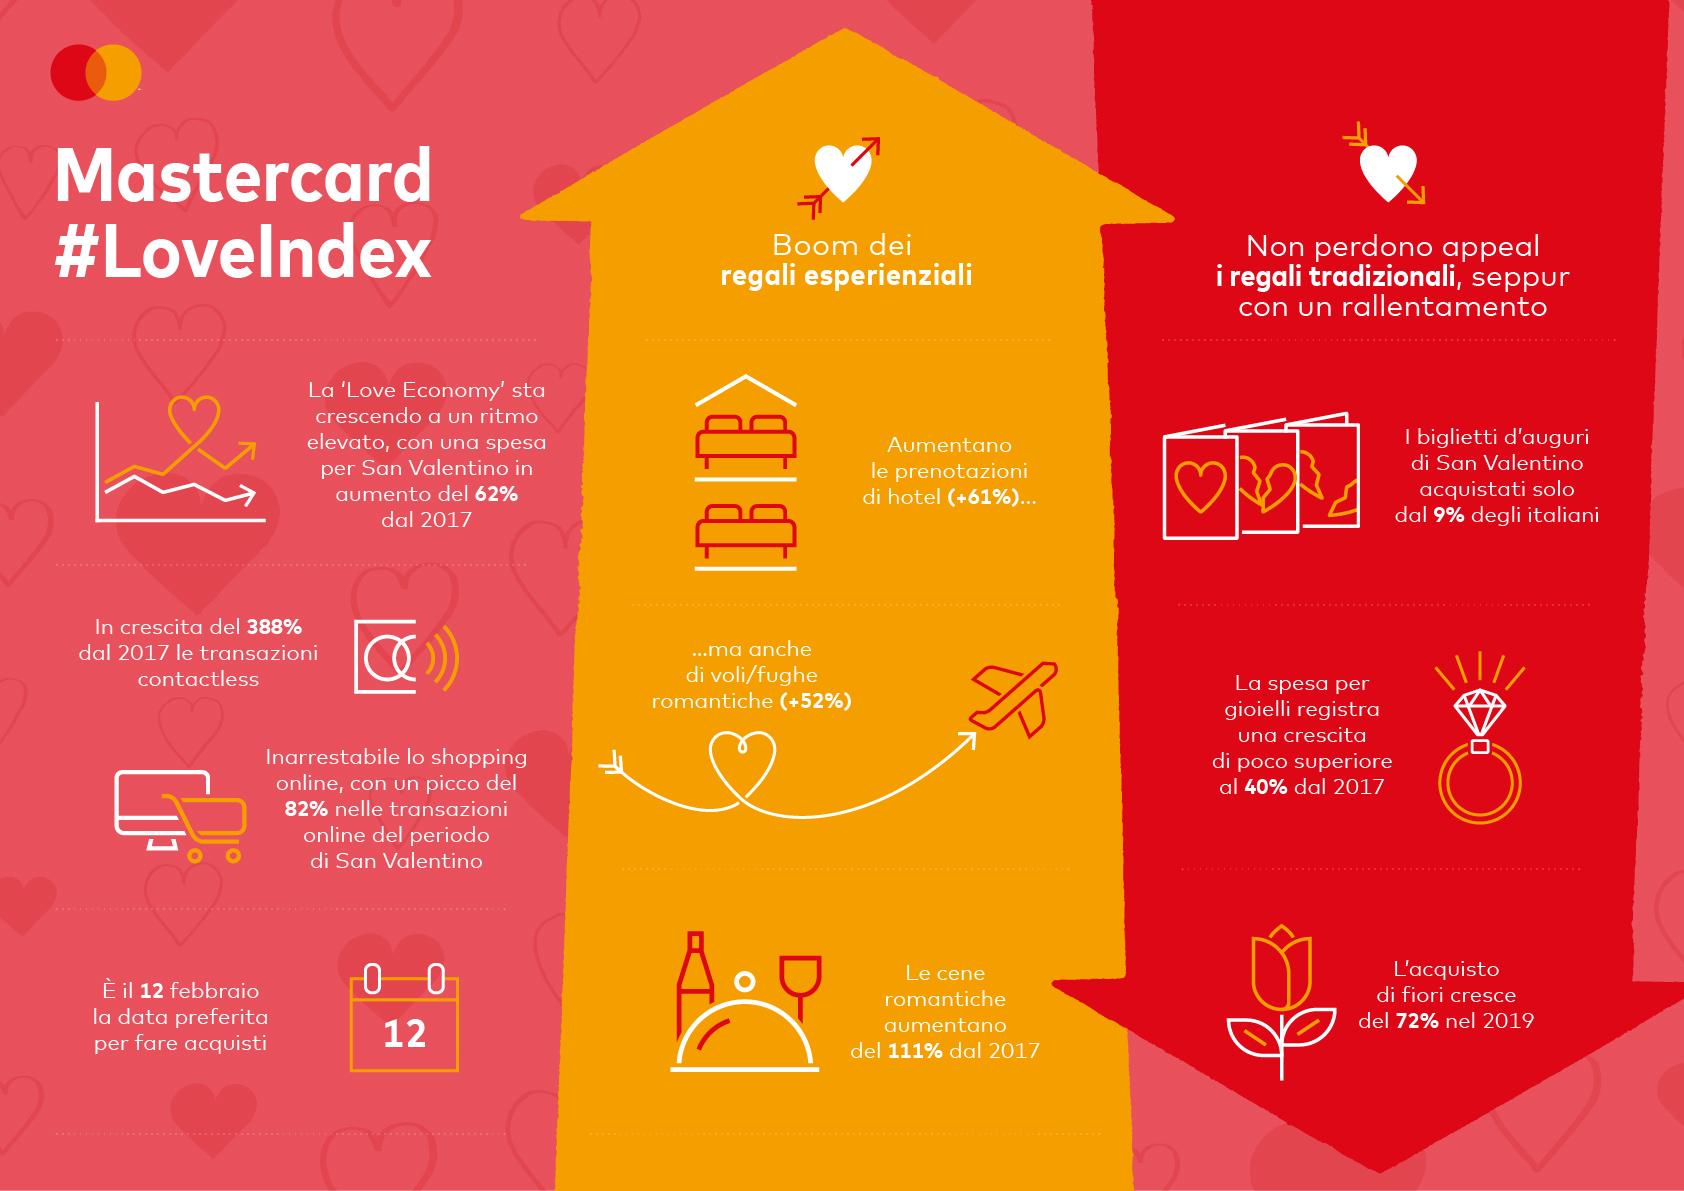 Mastercard_Love Index 2020 san valentino